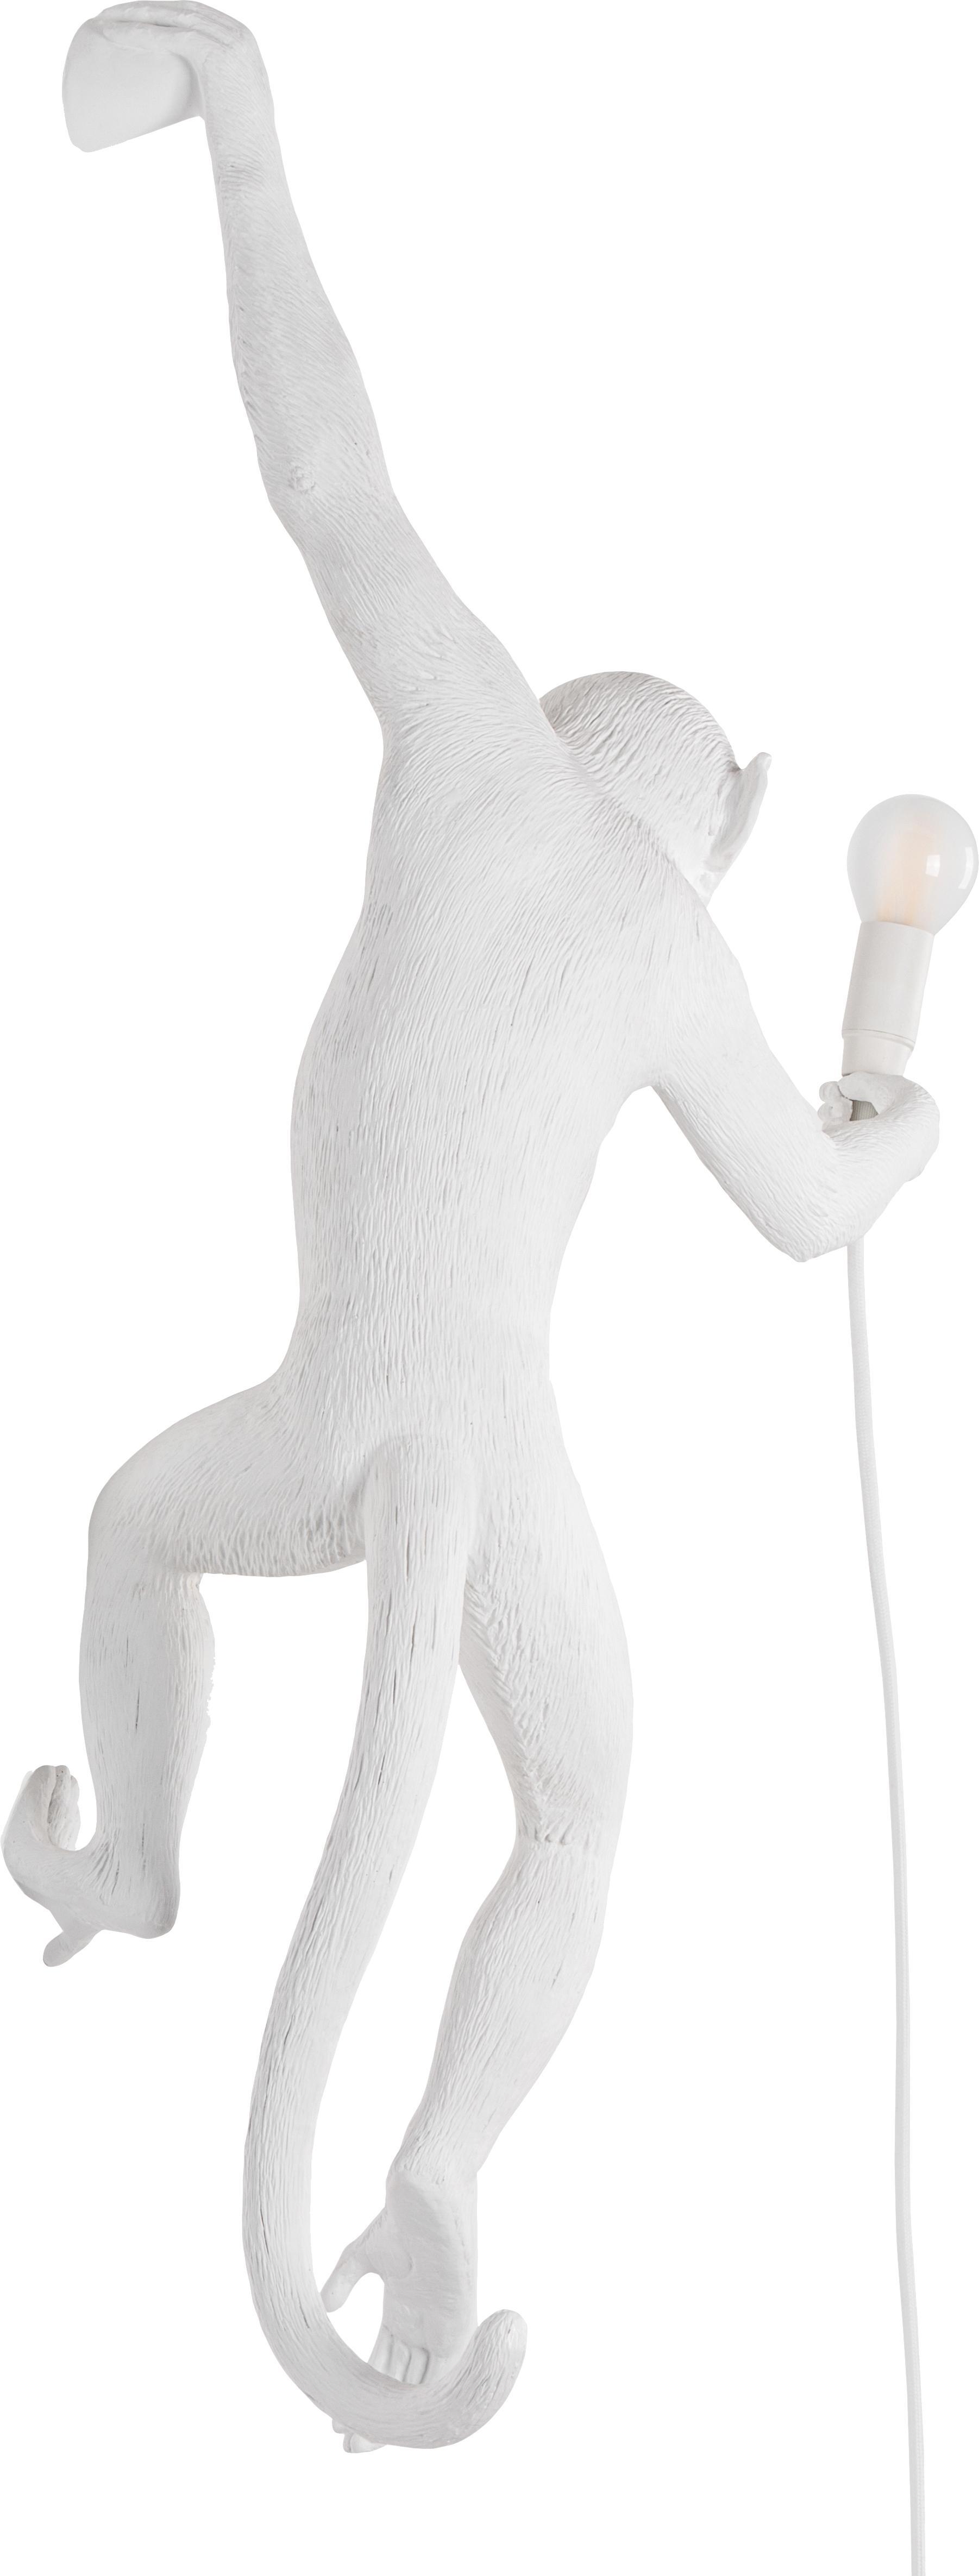 Applique a LED con spina Monkey, Resina, Bianco, Larg. 77 x Alt. 37 cm